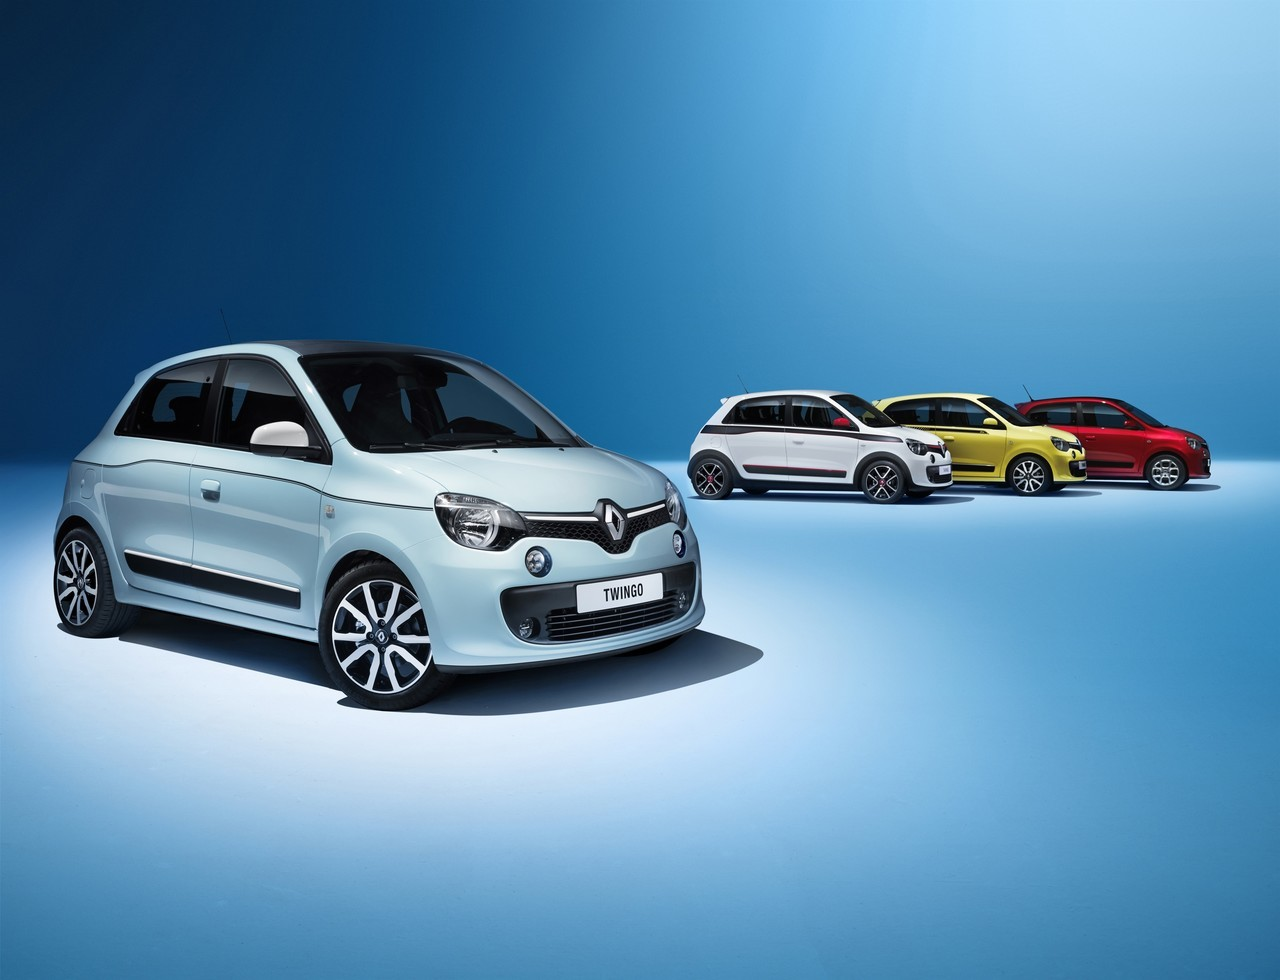 Foto de Renault Twingo 2014 (7/13)